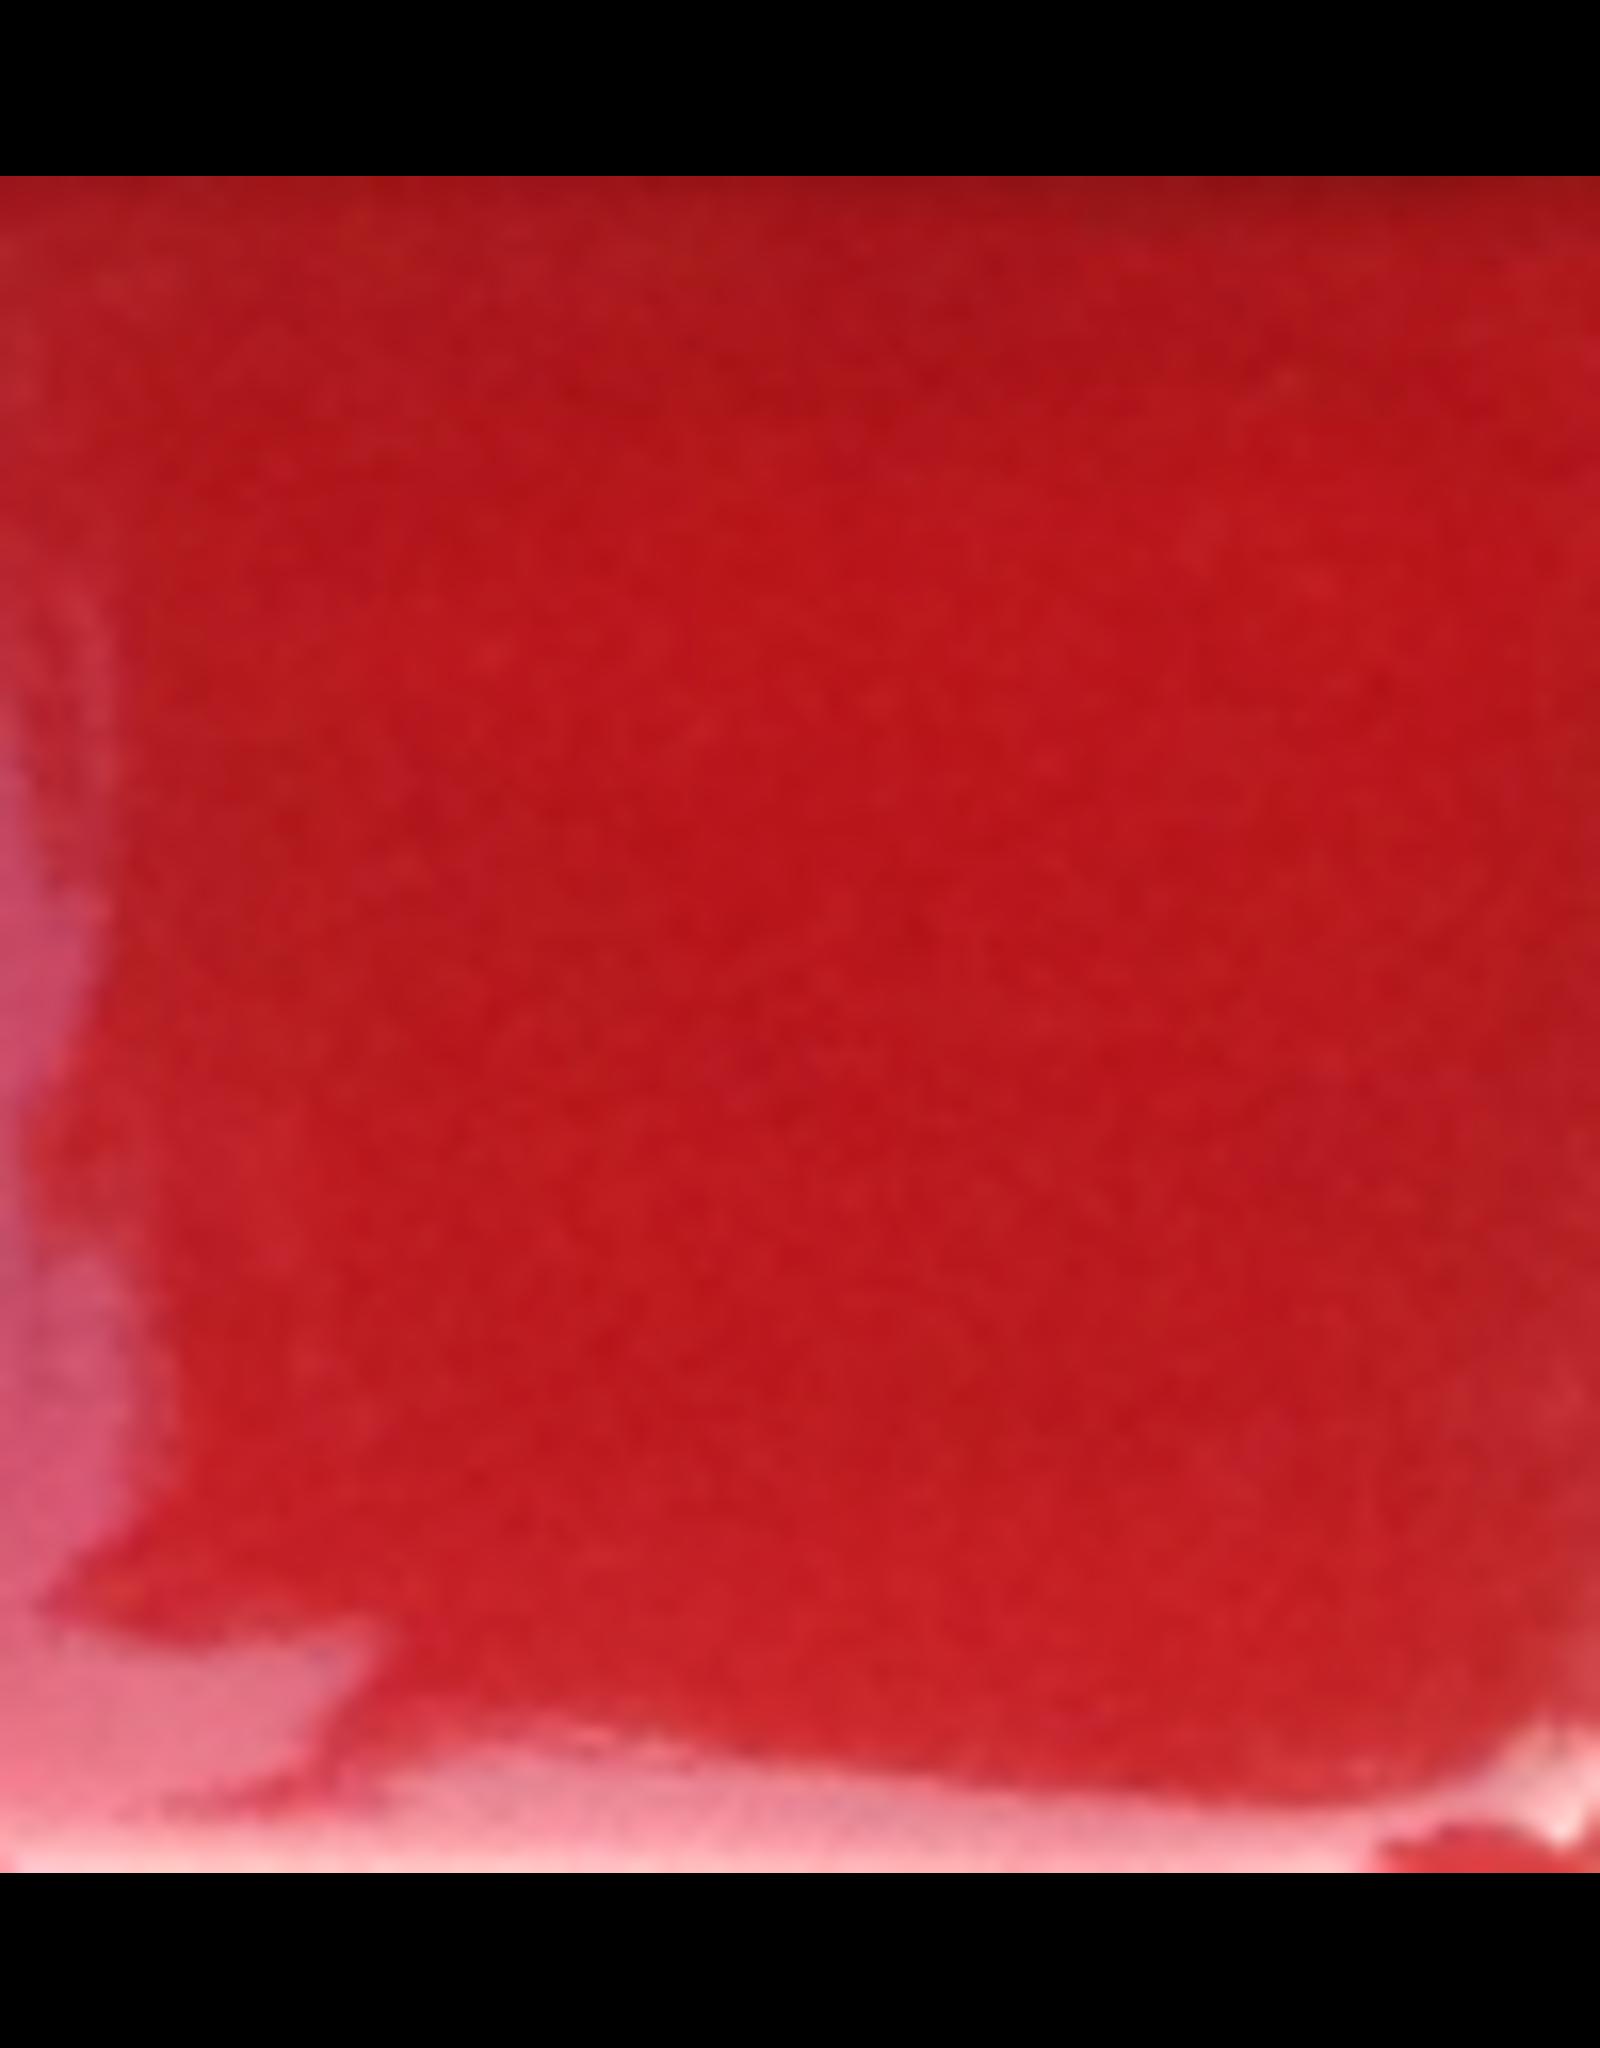 Contem UG47 Cherry red Underglaze